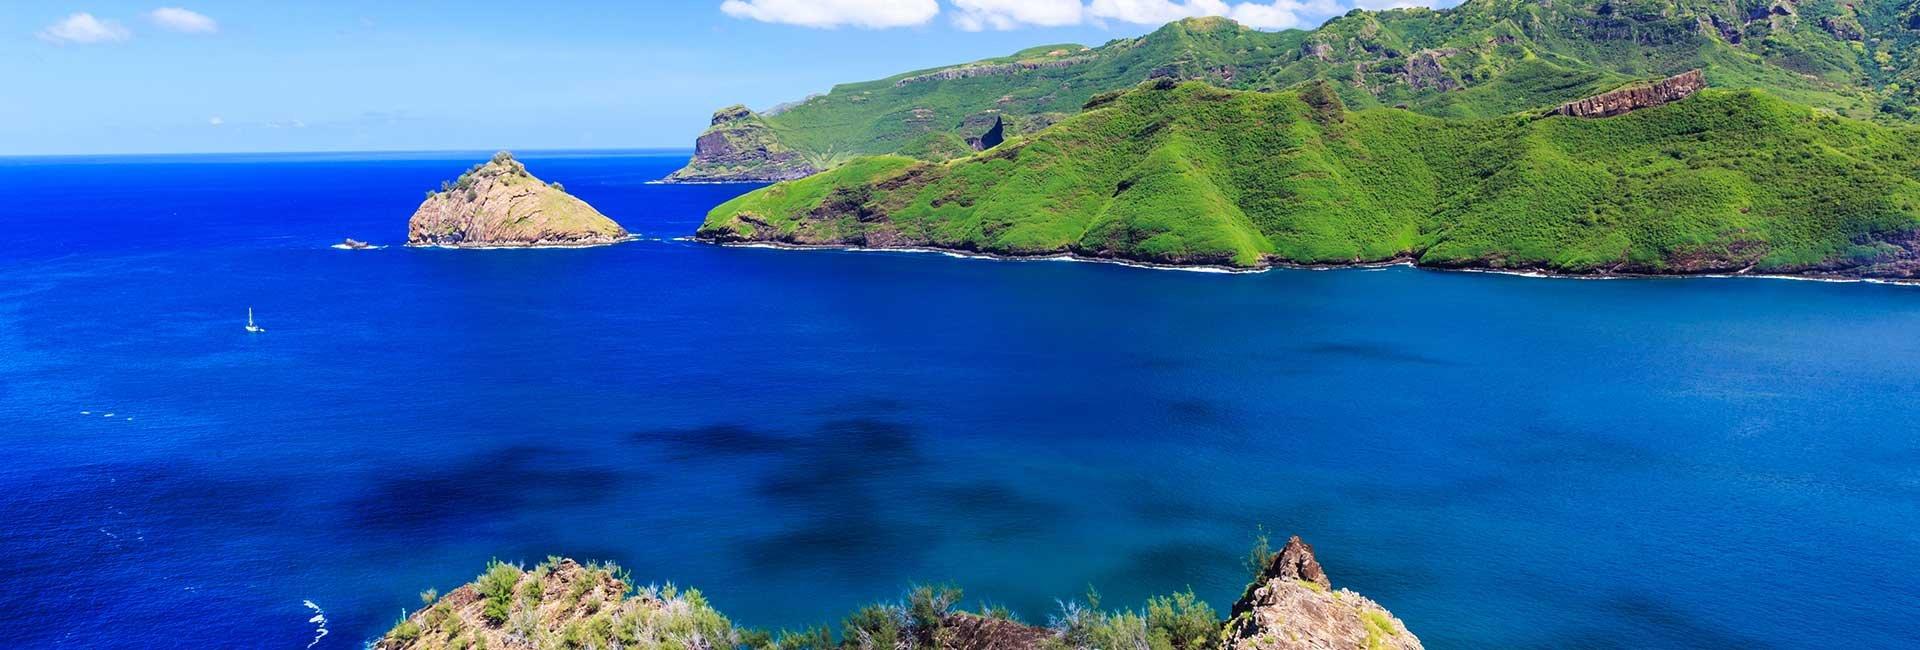 Blue ocean with islands